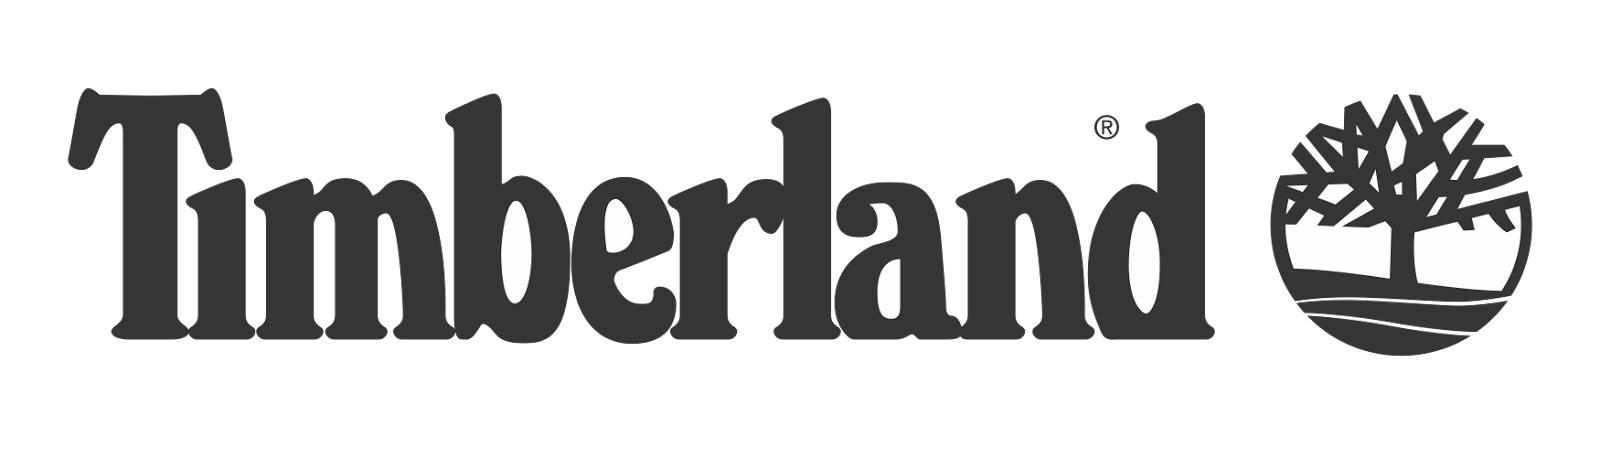 Timberland-vector-logo.png